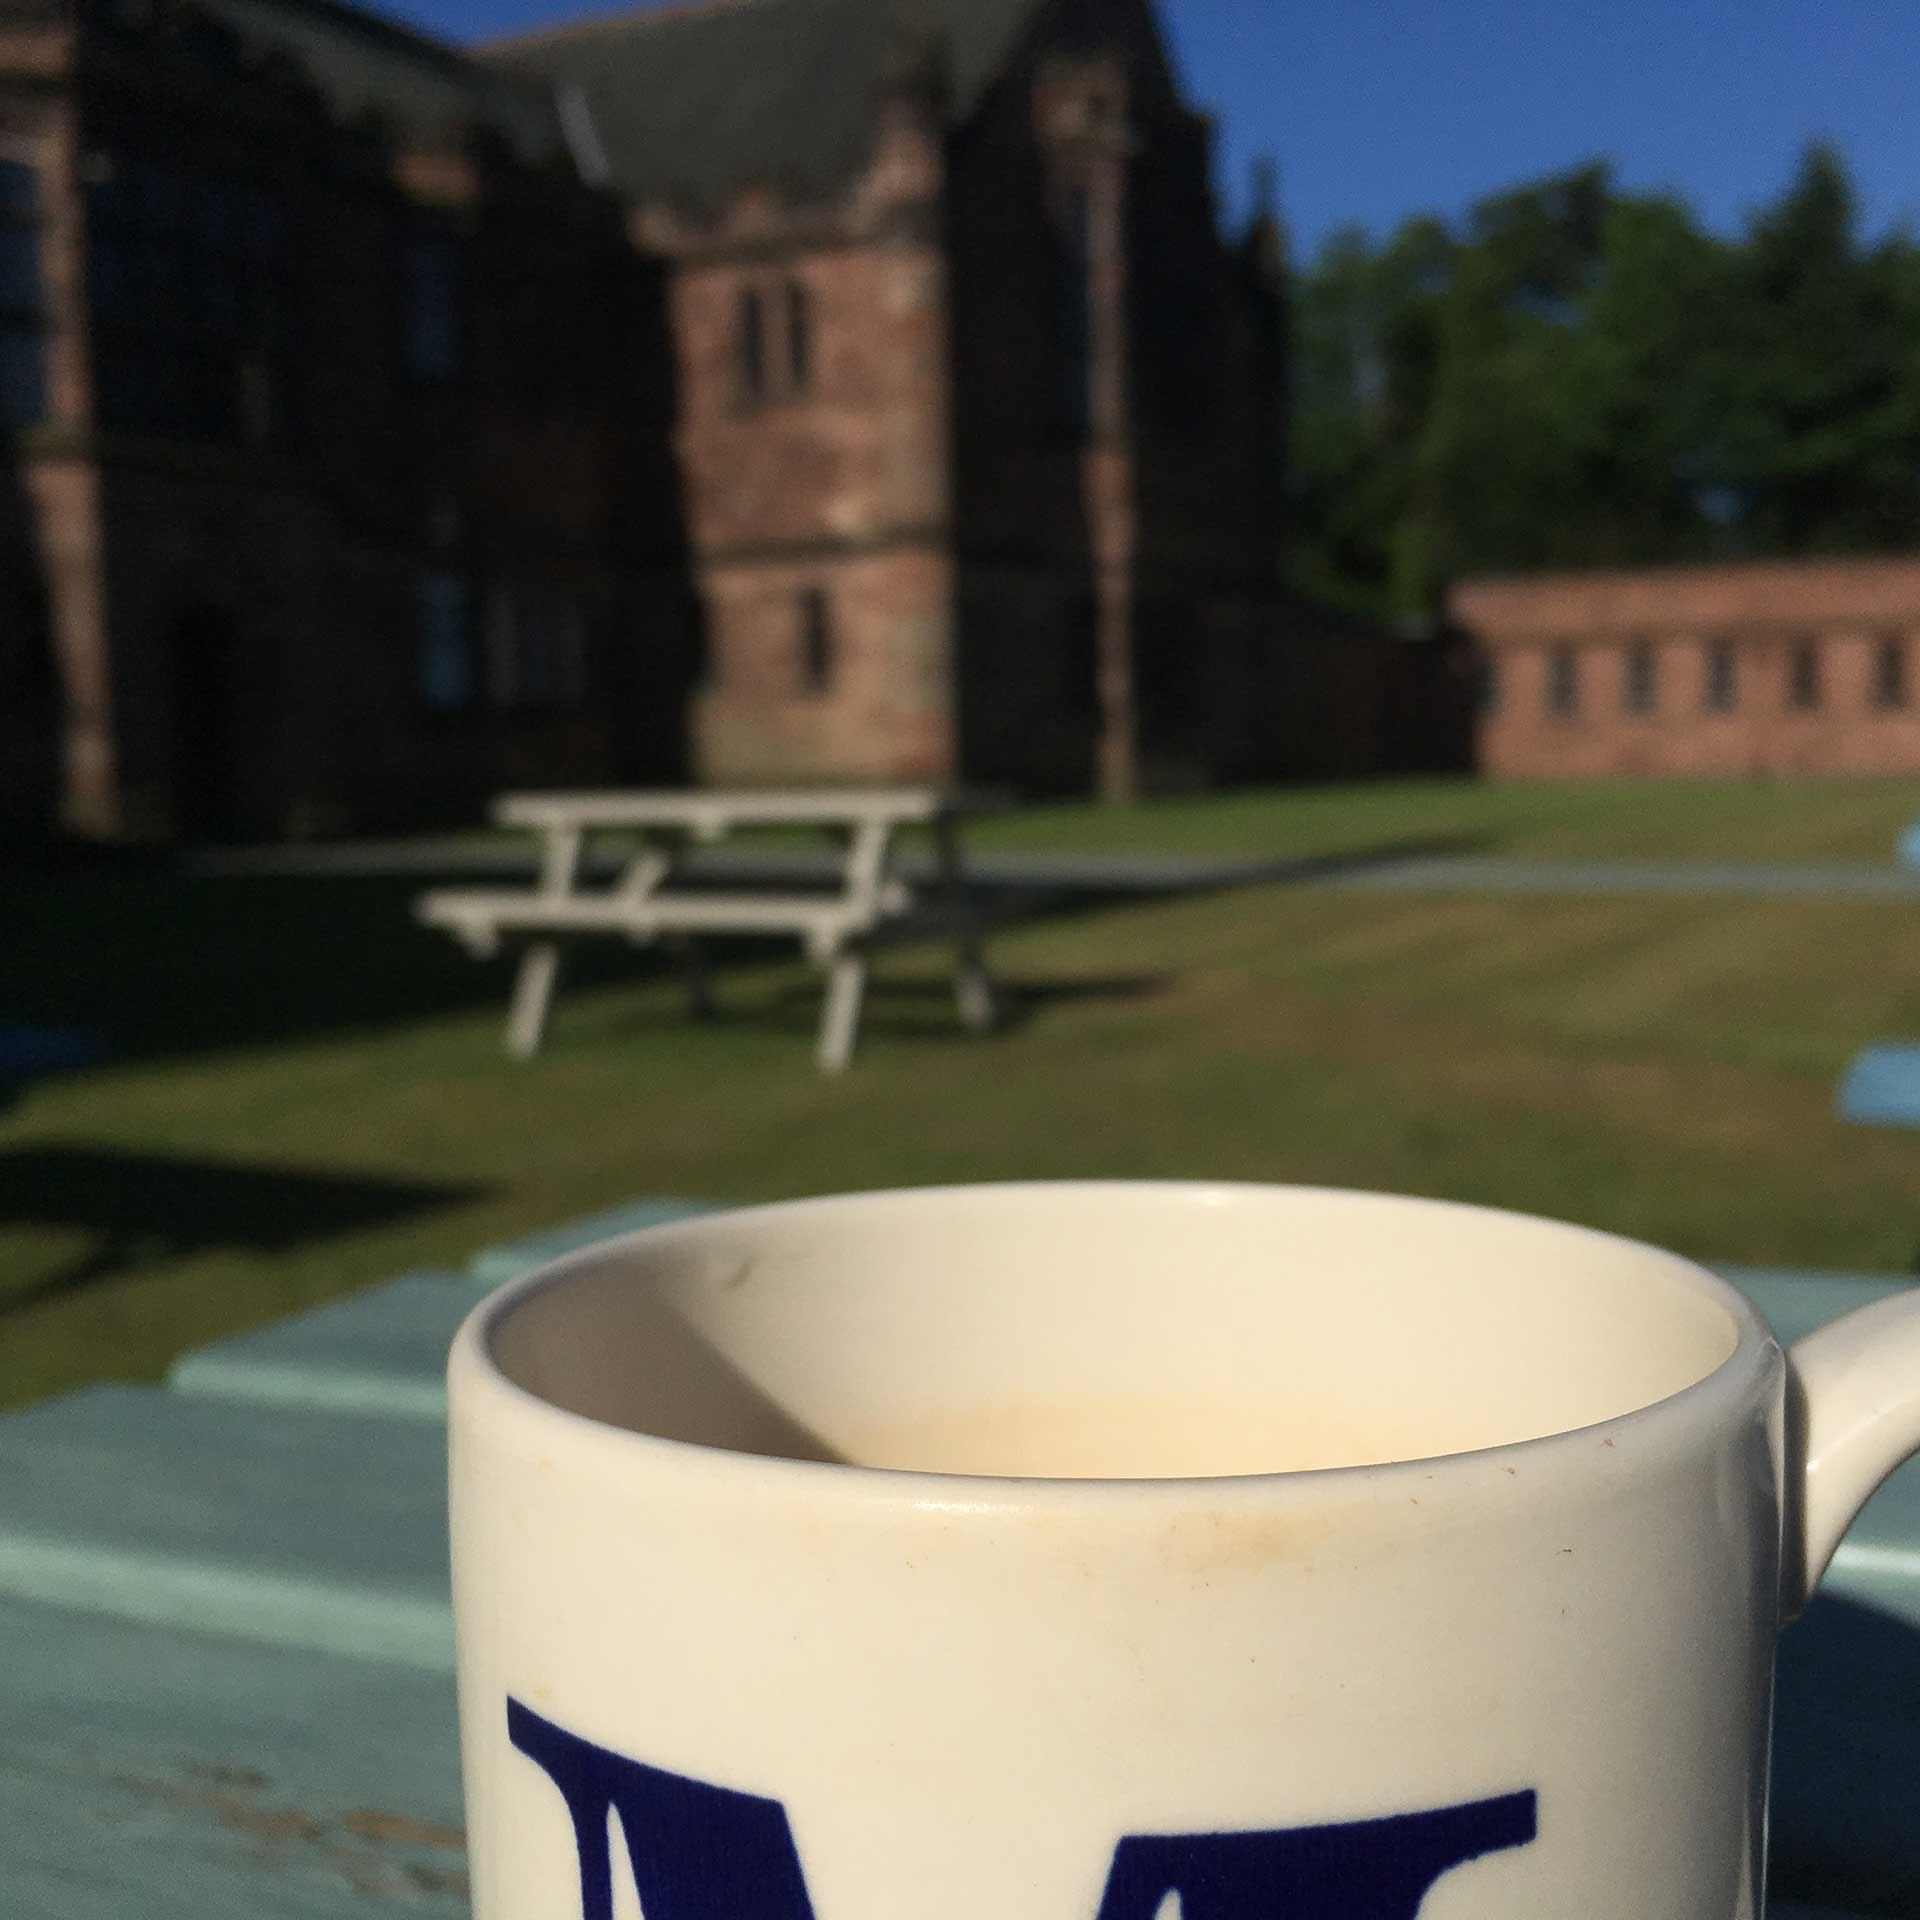 Tea at Gladstone's